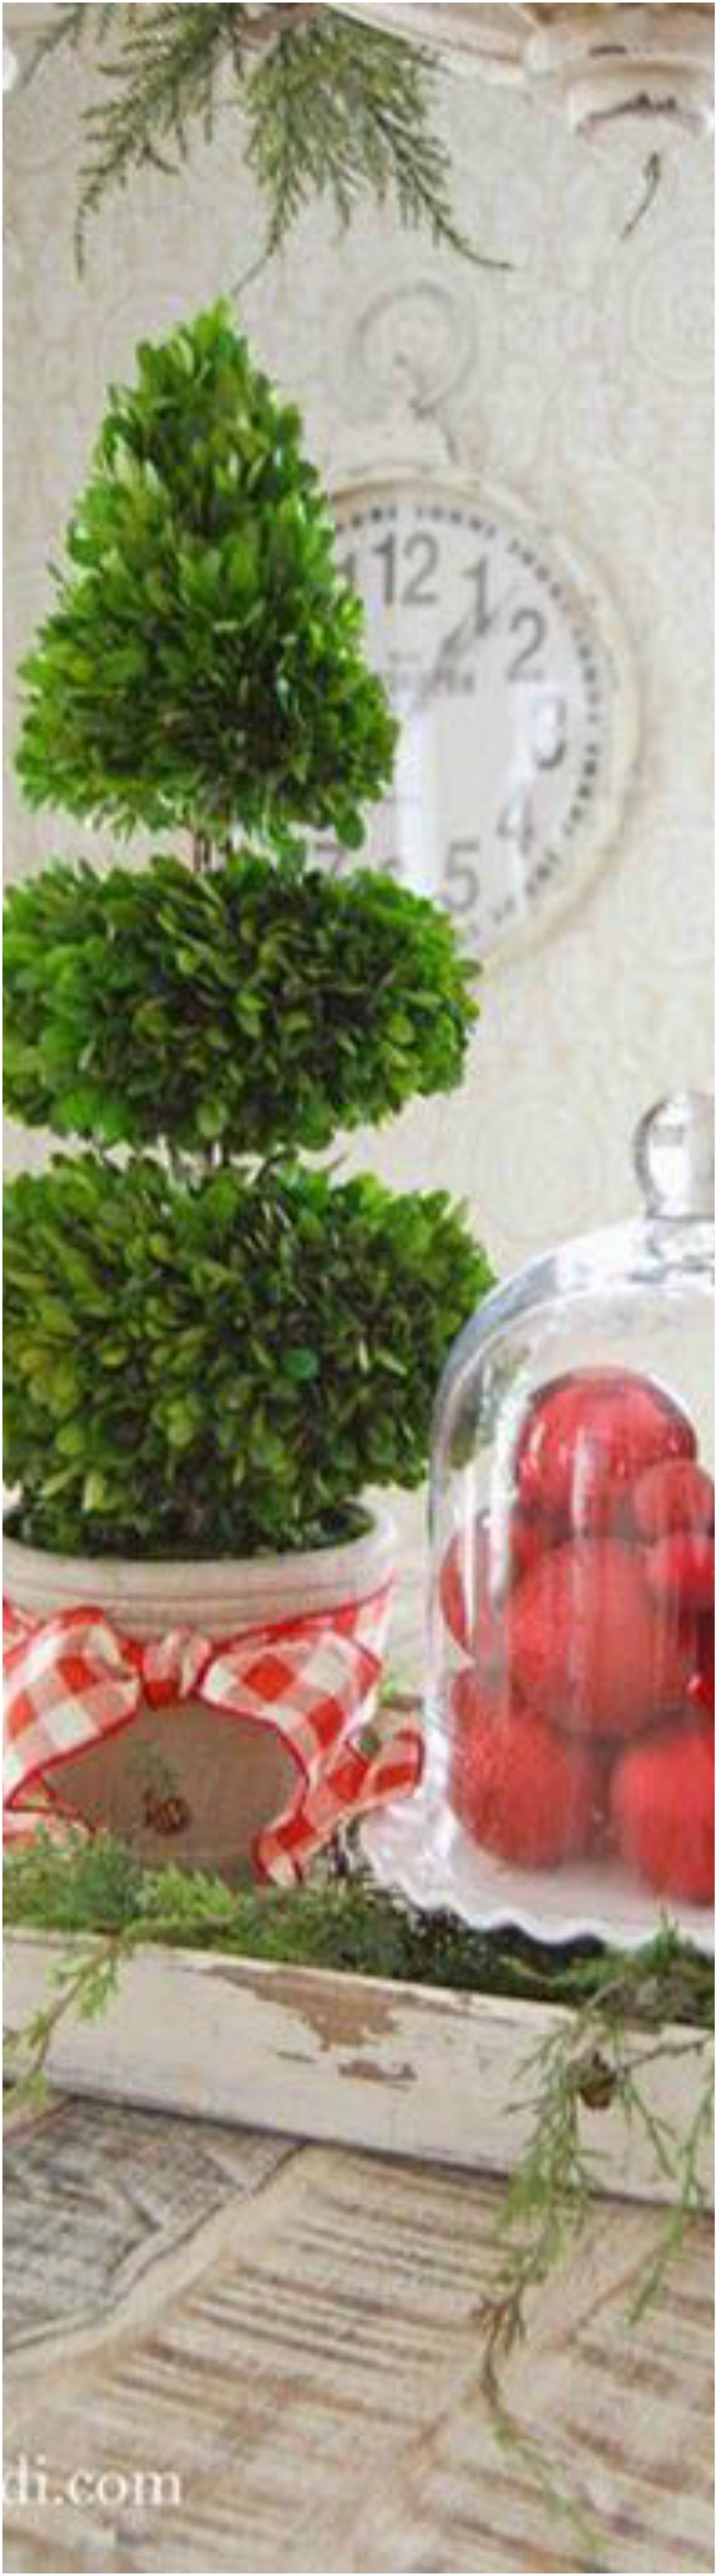 christmas-kitchen-decorations-xmas-decorations thewowdecor